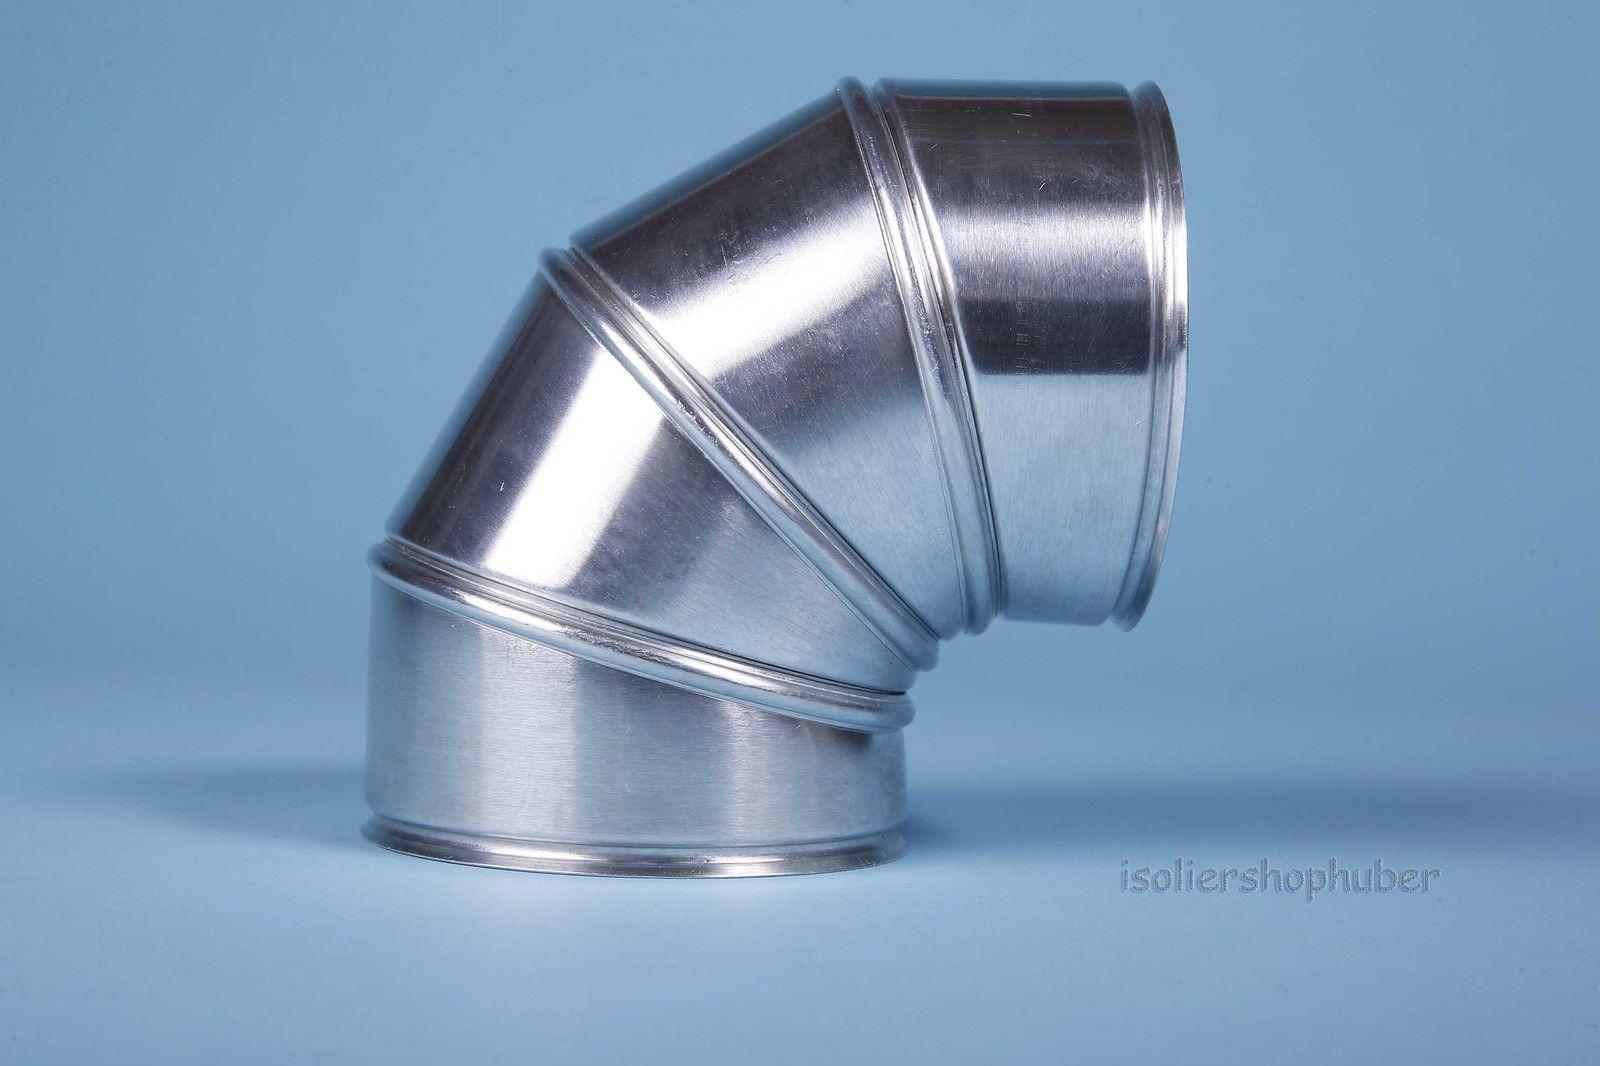 verzinktes Blech Rohr für Rohrisolierung Ummantelung aus Blech Kaminrohr